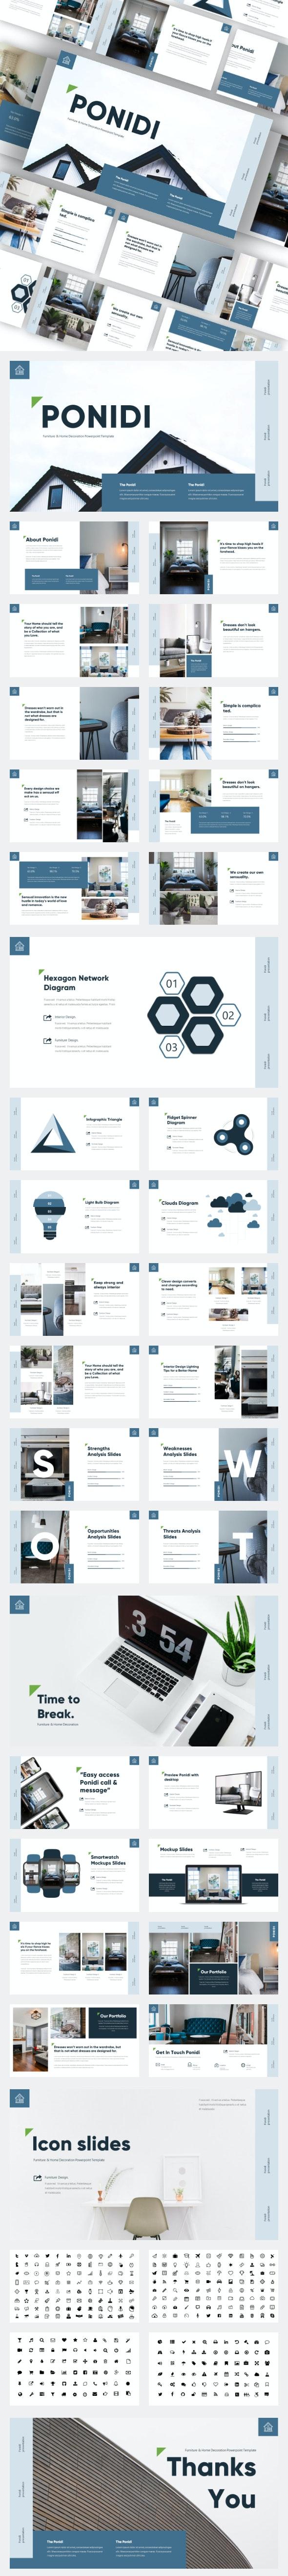 Ponidi - Furniture & Home Decoration Google Slides Template - Business PowerPoint Templates